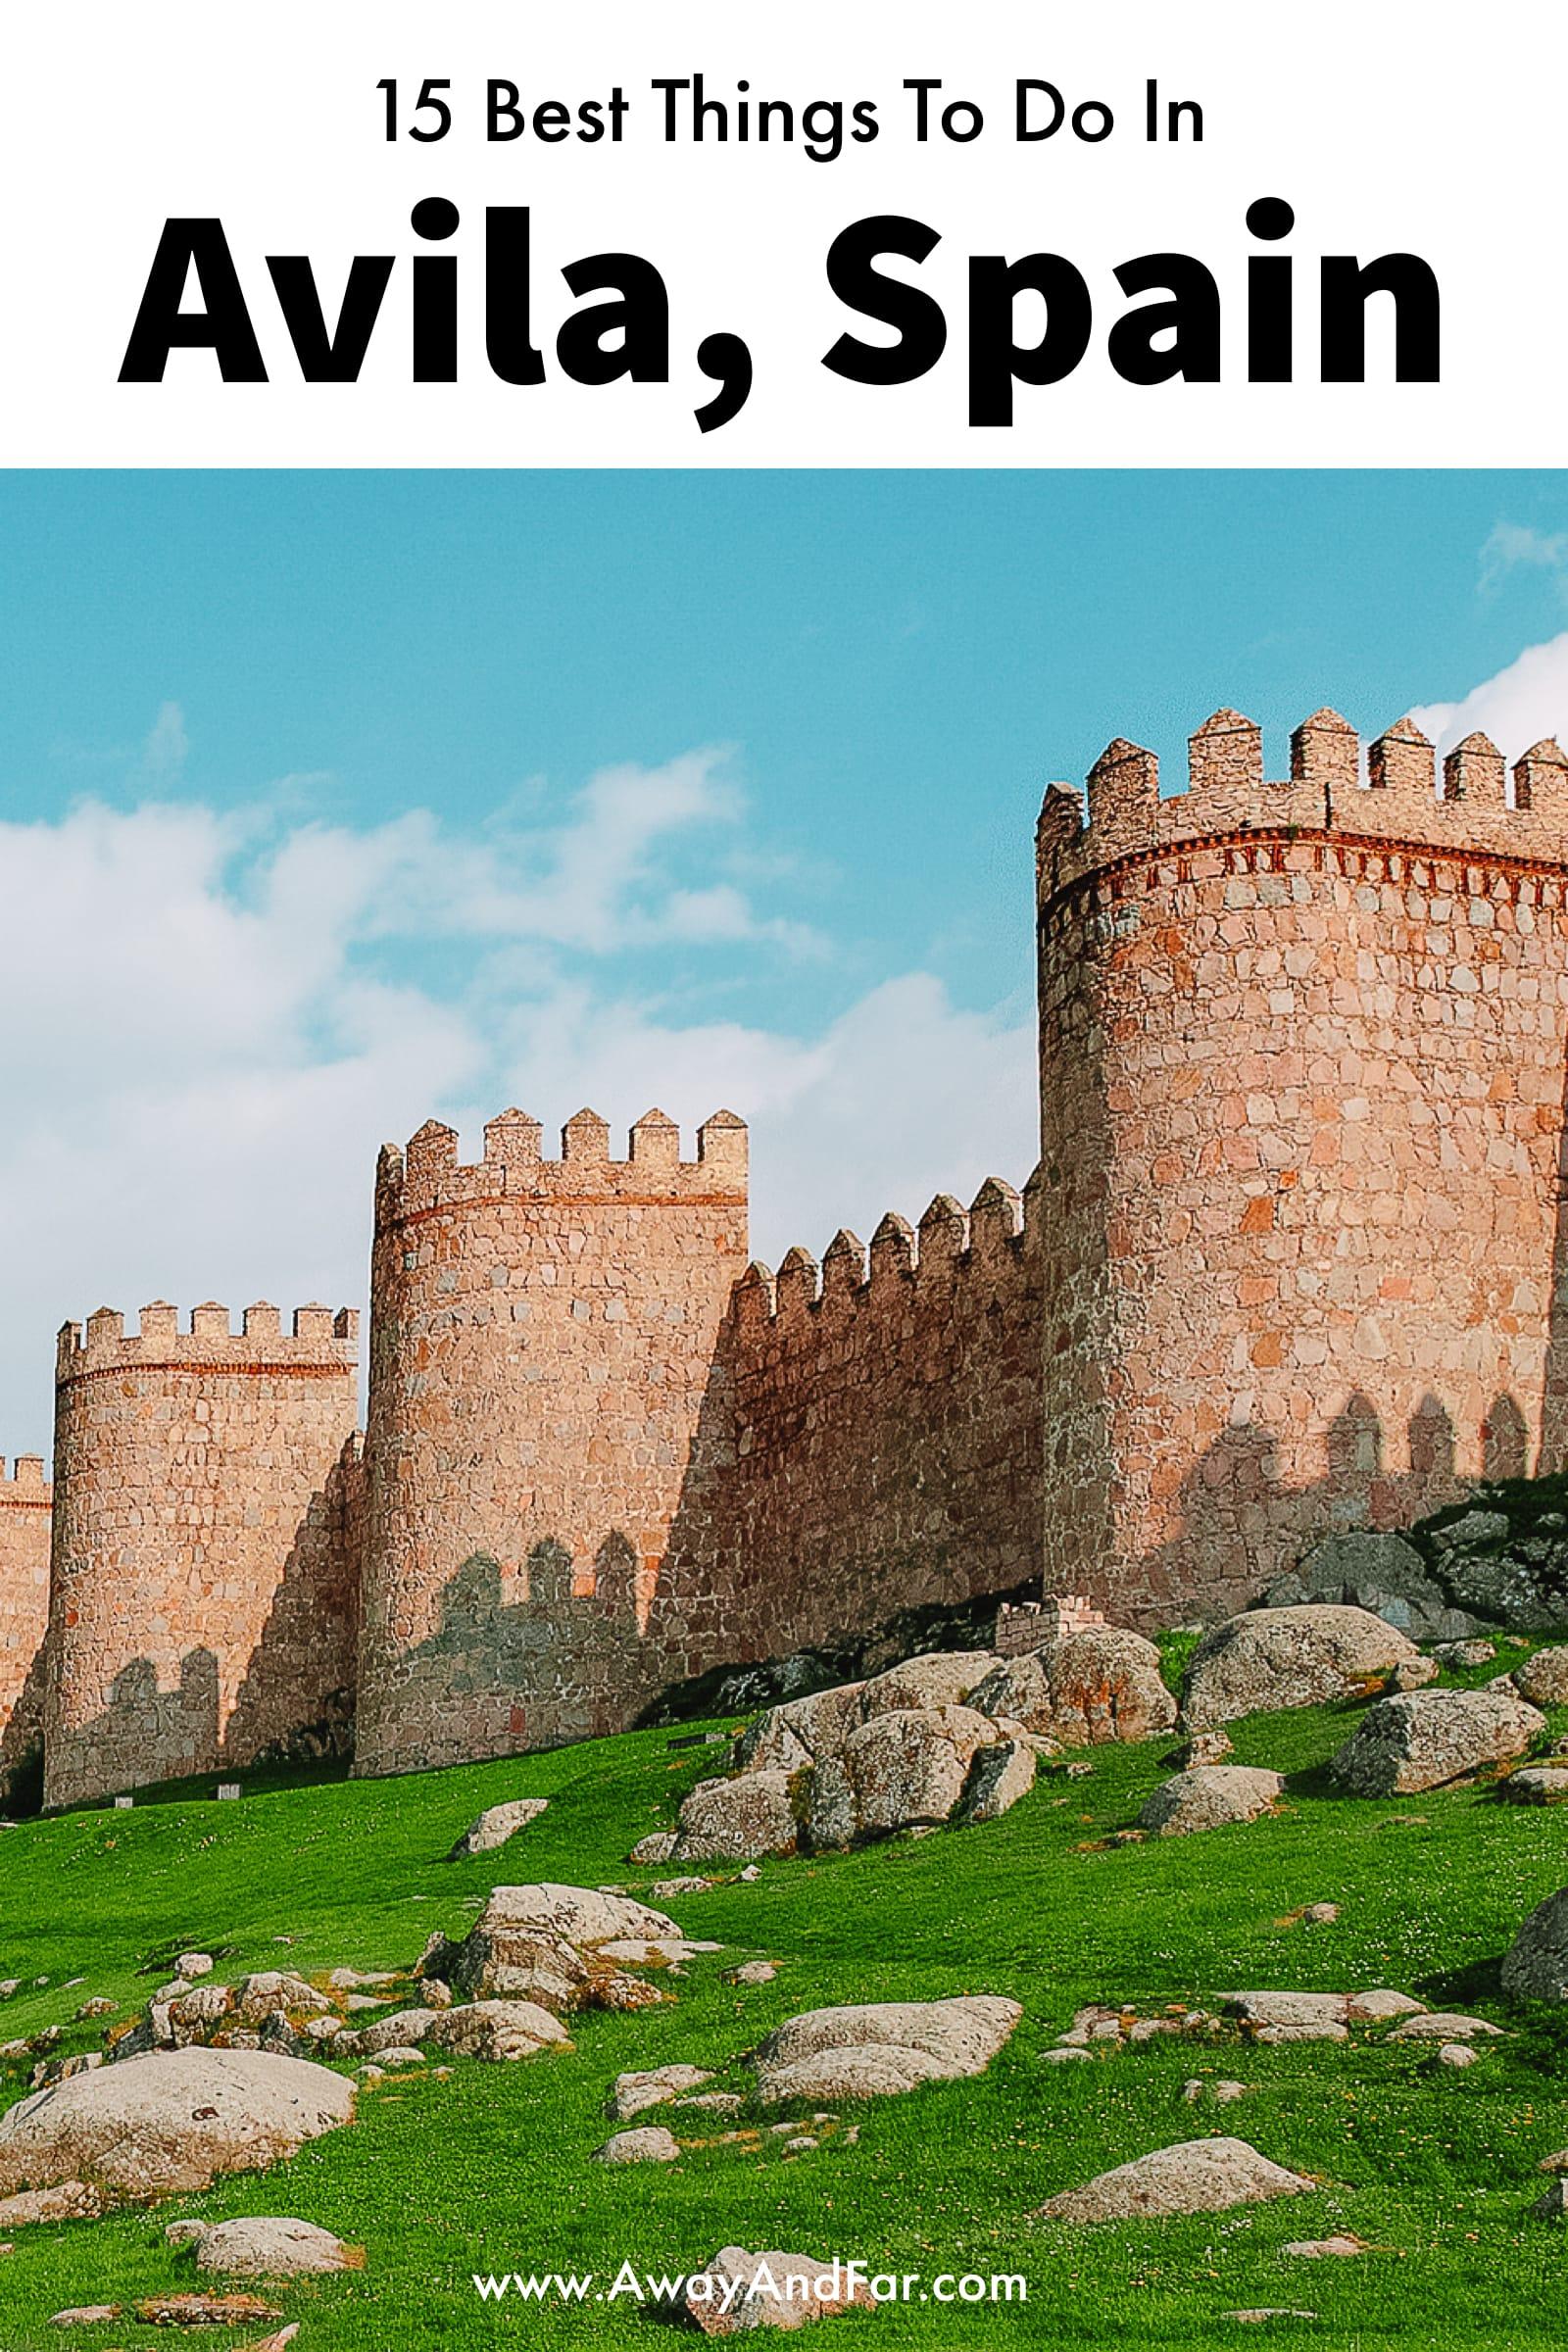 15 Best Things To Do In Avila, Spain (1)